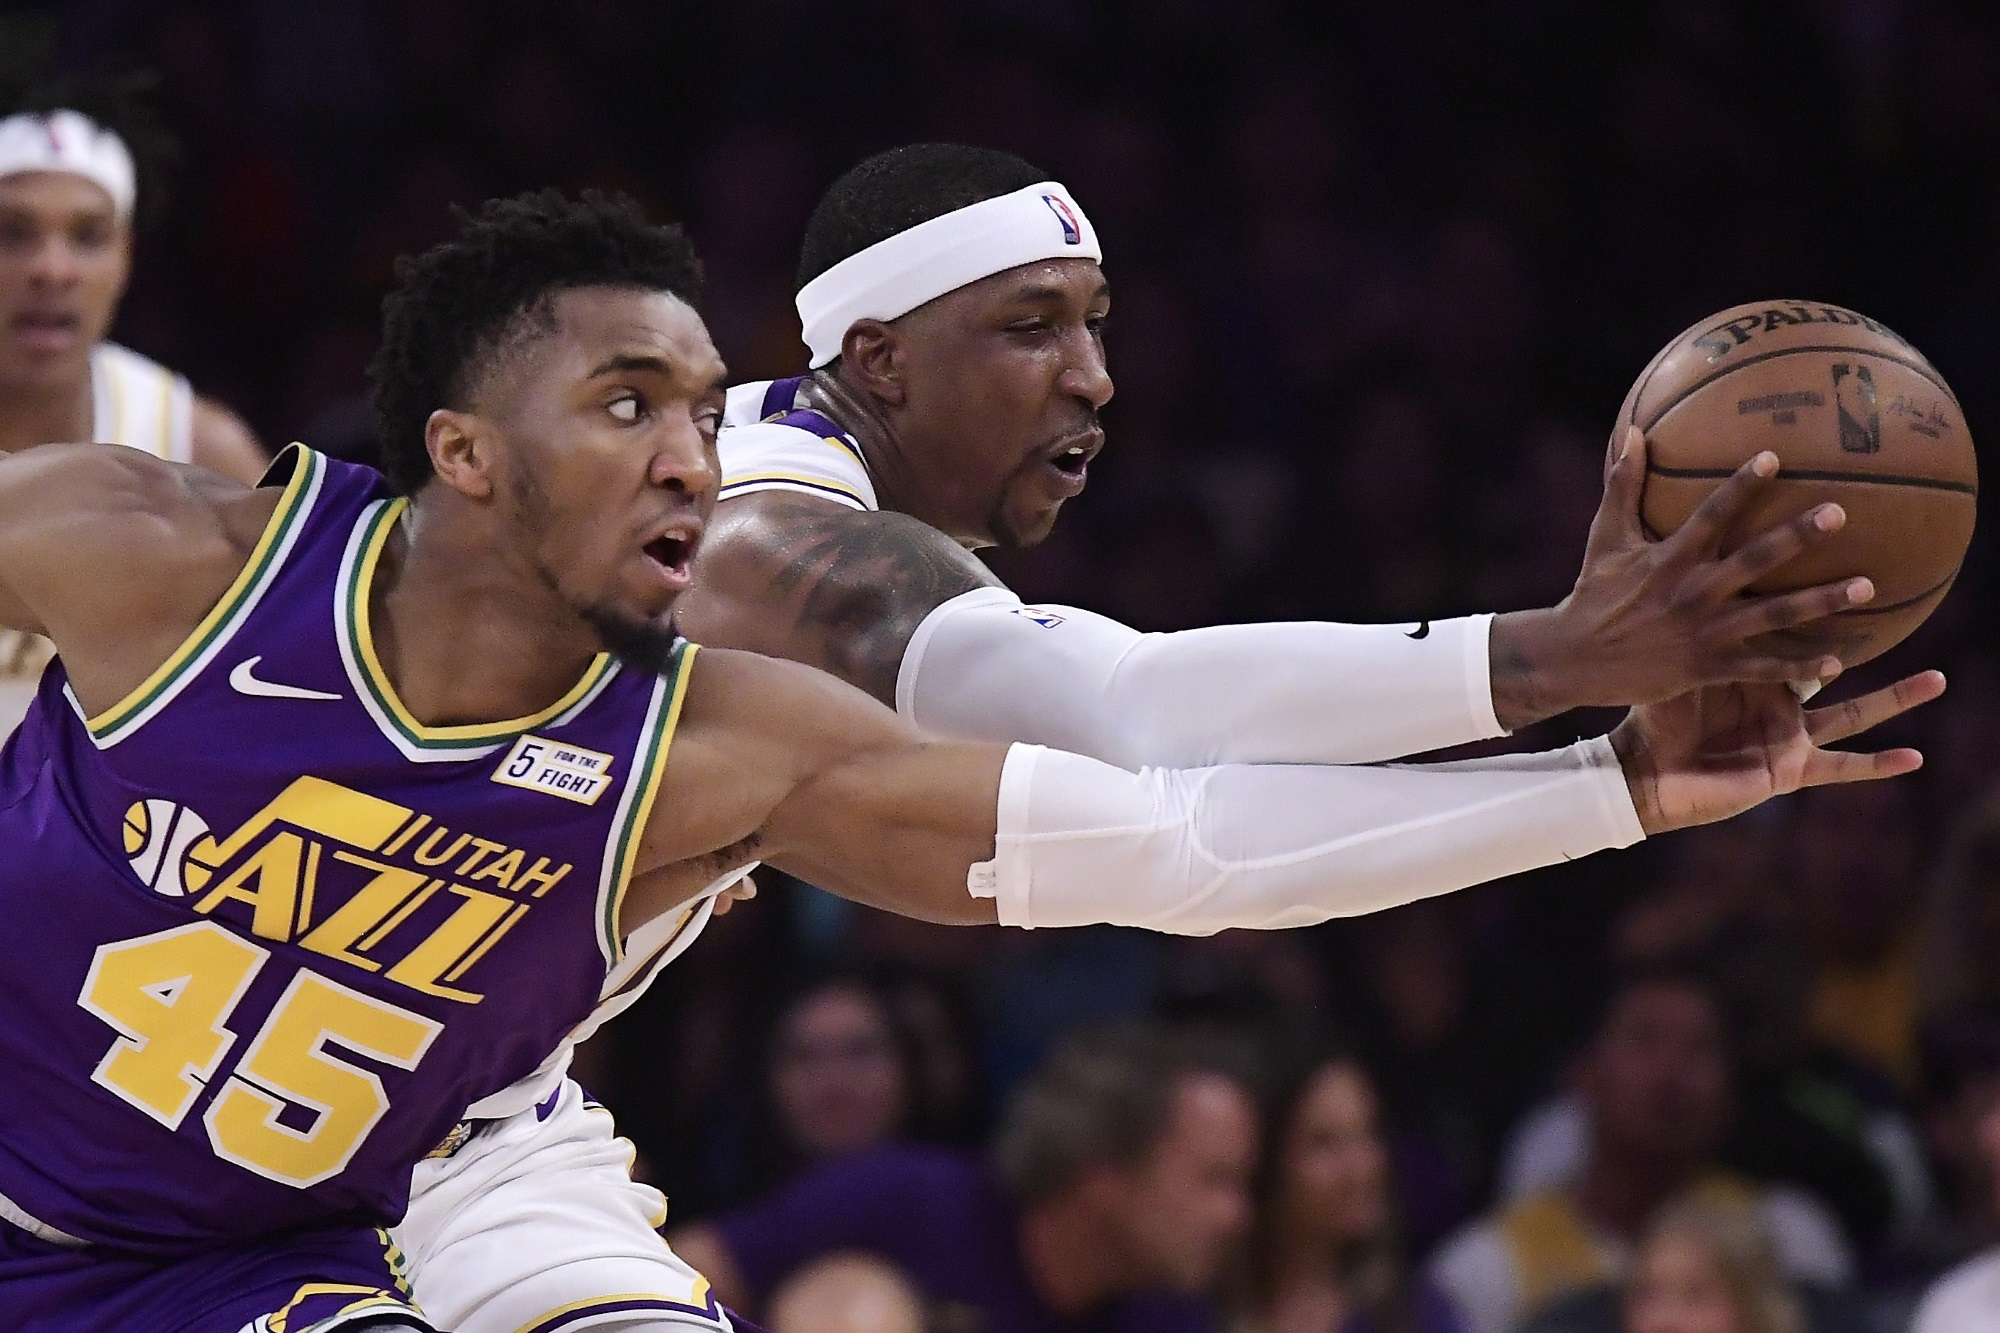 Donovan Mitchell and Kentavious Caldwell-Pope, Los Angeles Lakers vs Utah Jazz at Staples Center